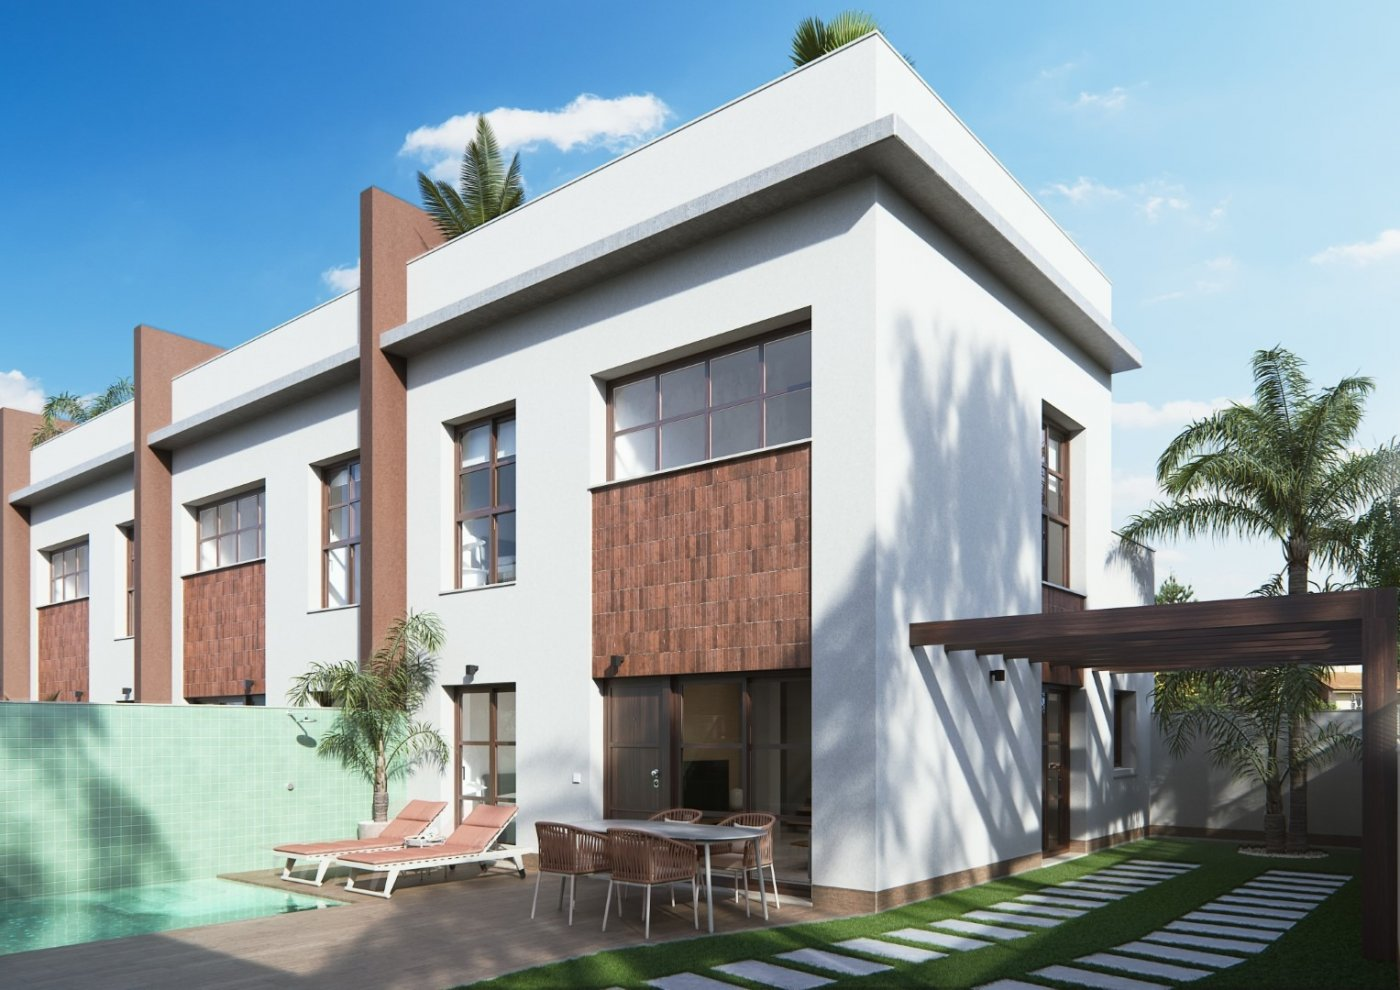 Townhouse - New Build - Pilar de la Horadada - Pilar de la Horadada